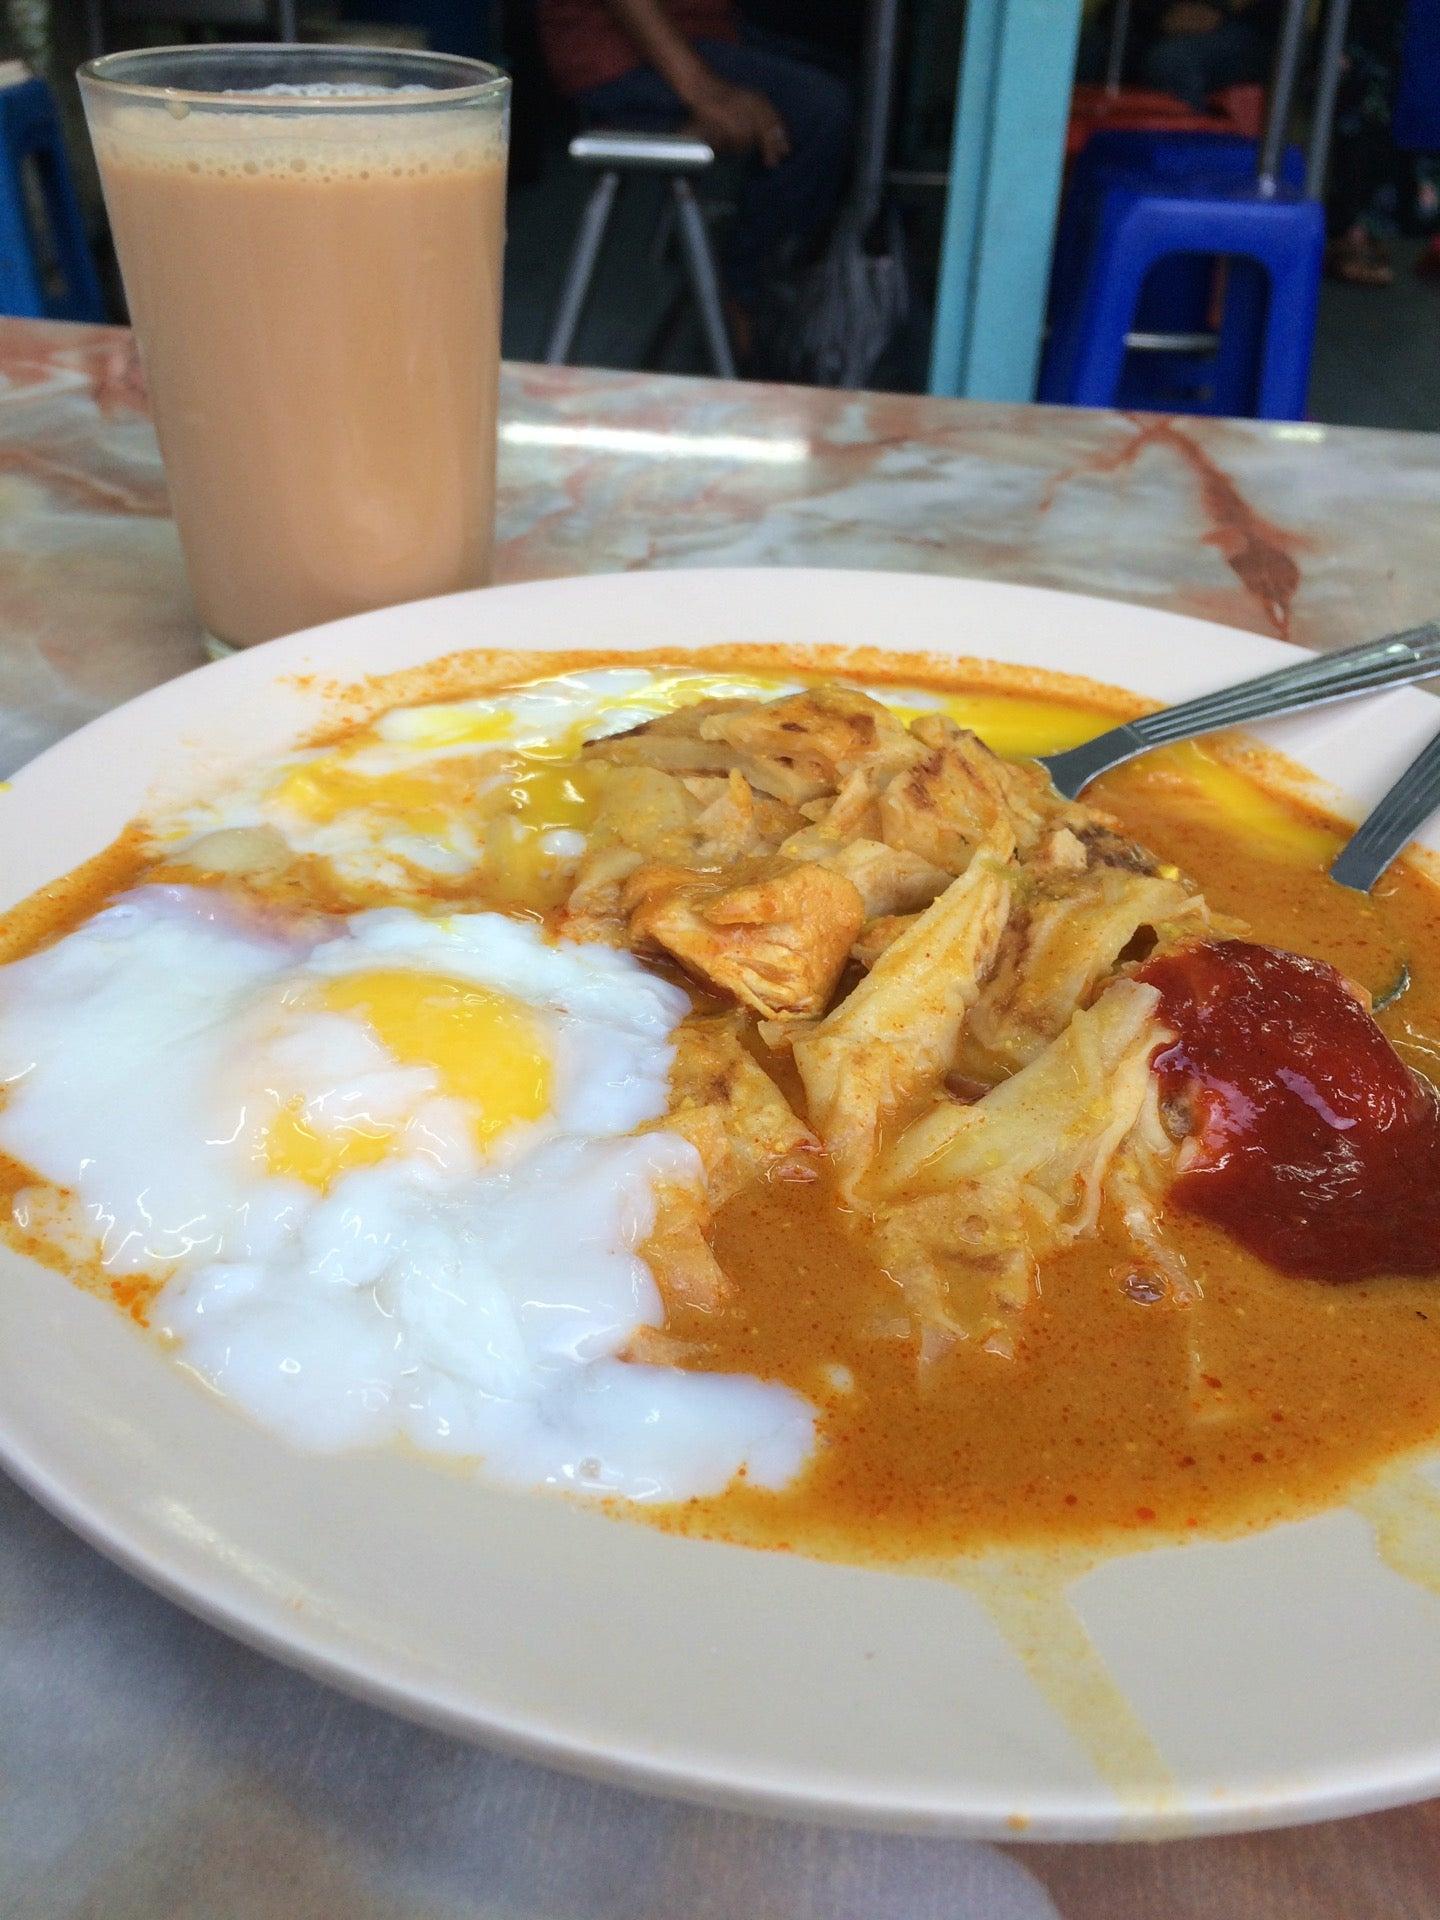 相片 - 位於Kuala Lumpur City Center(吉隆坡市中心)的Mansion Tea Stall | Restaurant - 雪隆區